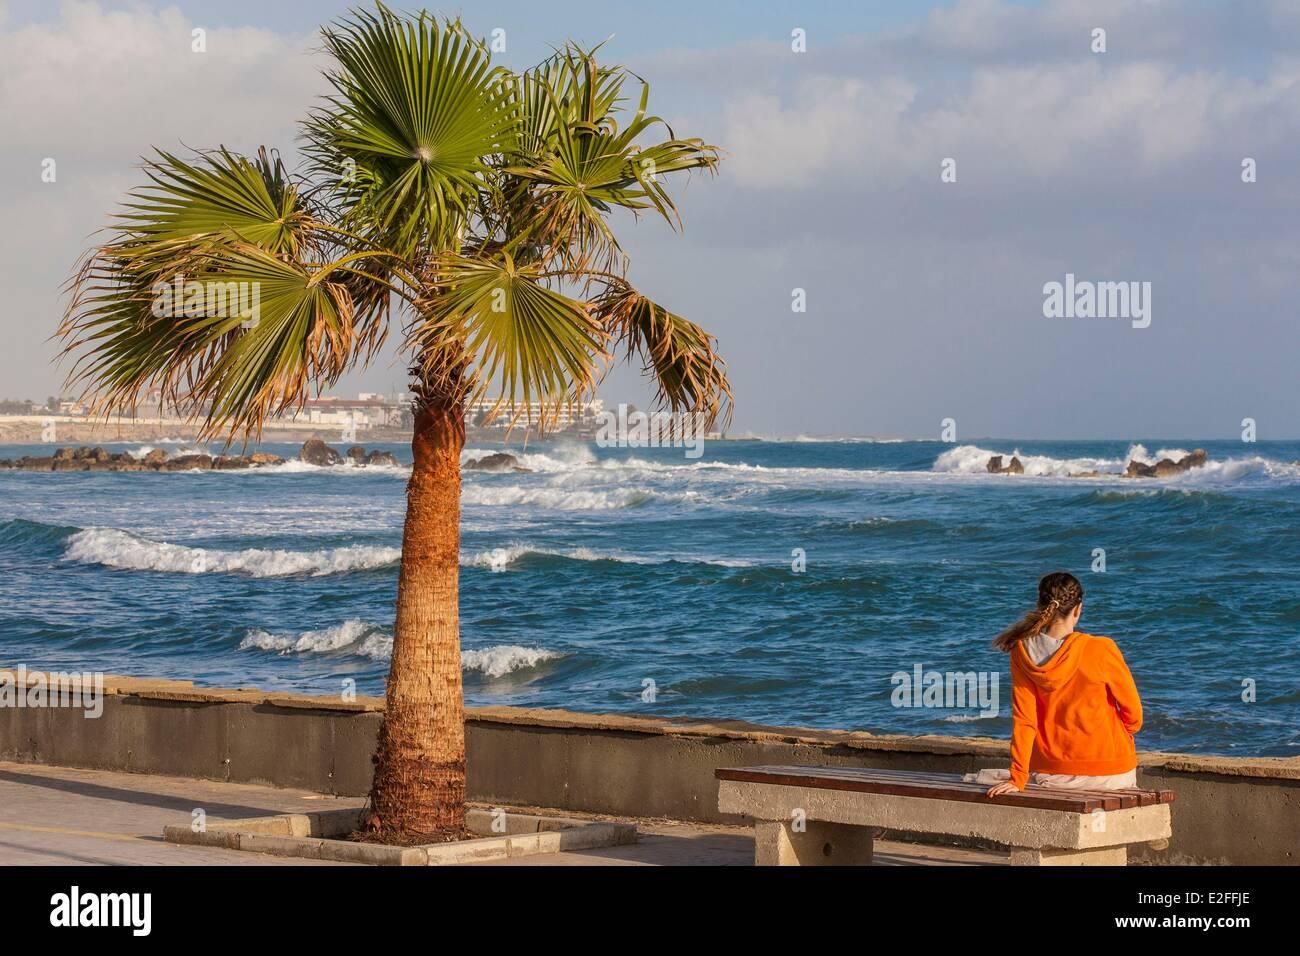 Cyprus, Paphos, seafront promenade - Stock Image